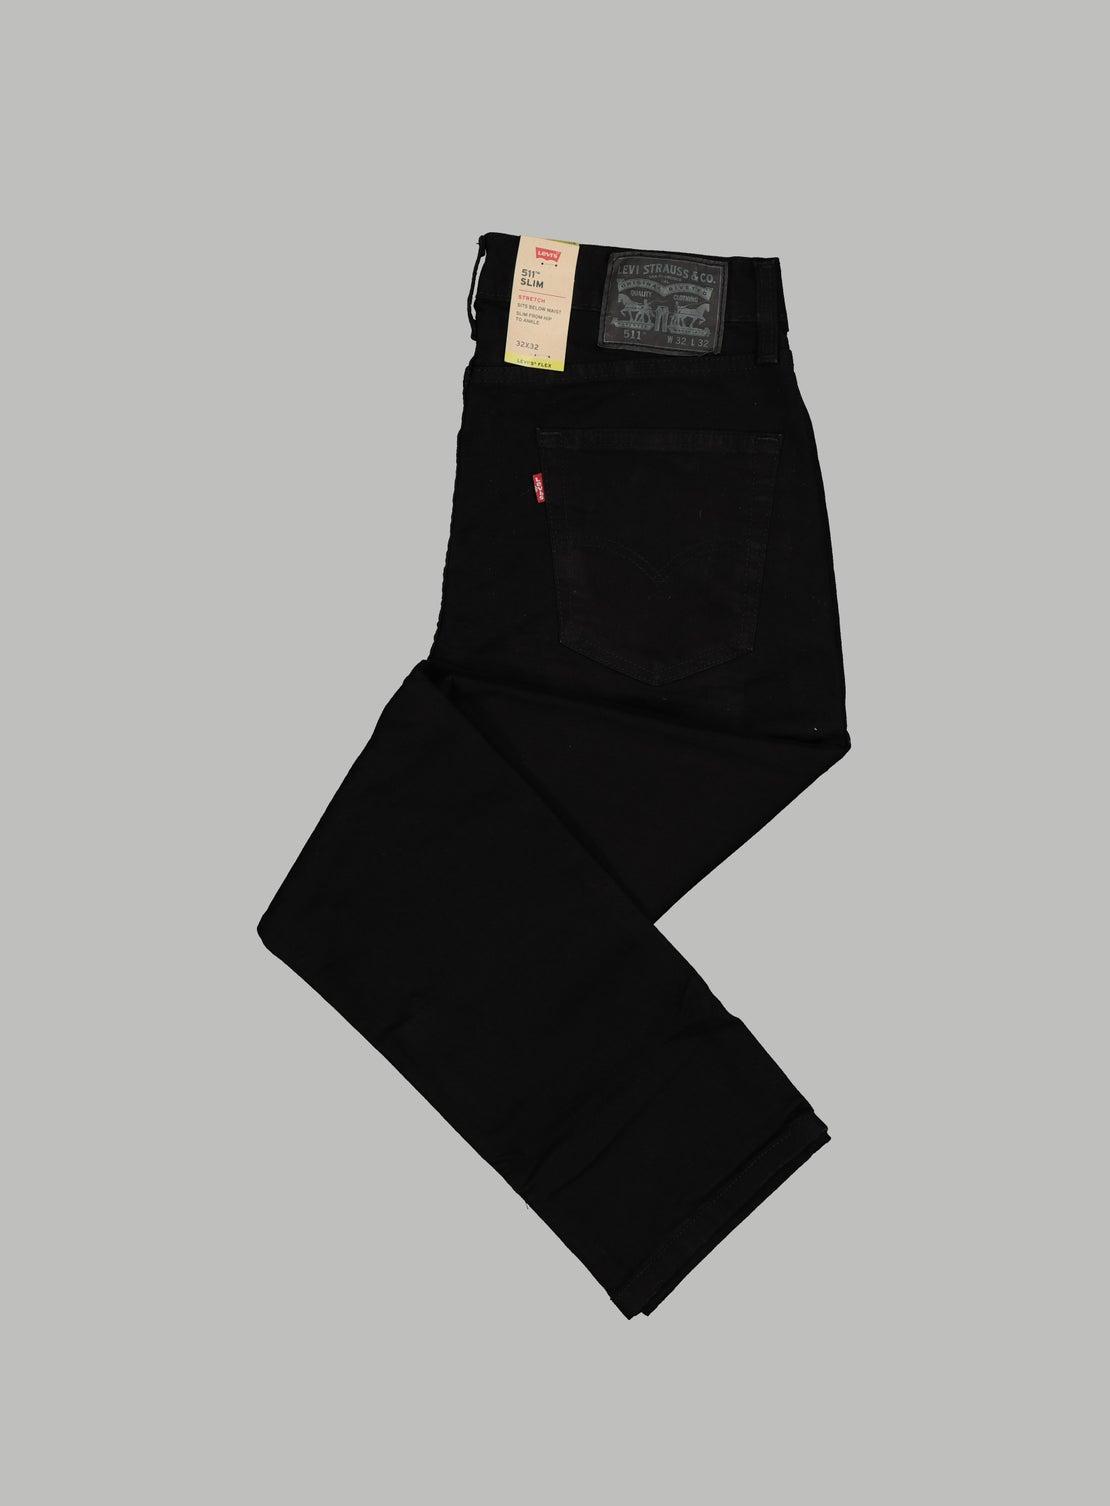 Levi's 511 Slim - Native Cali Black